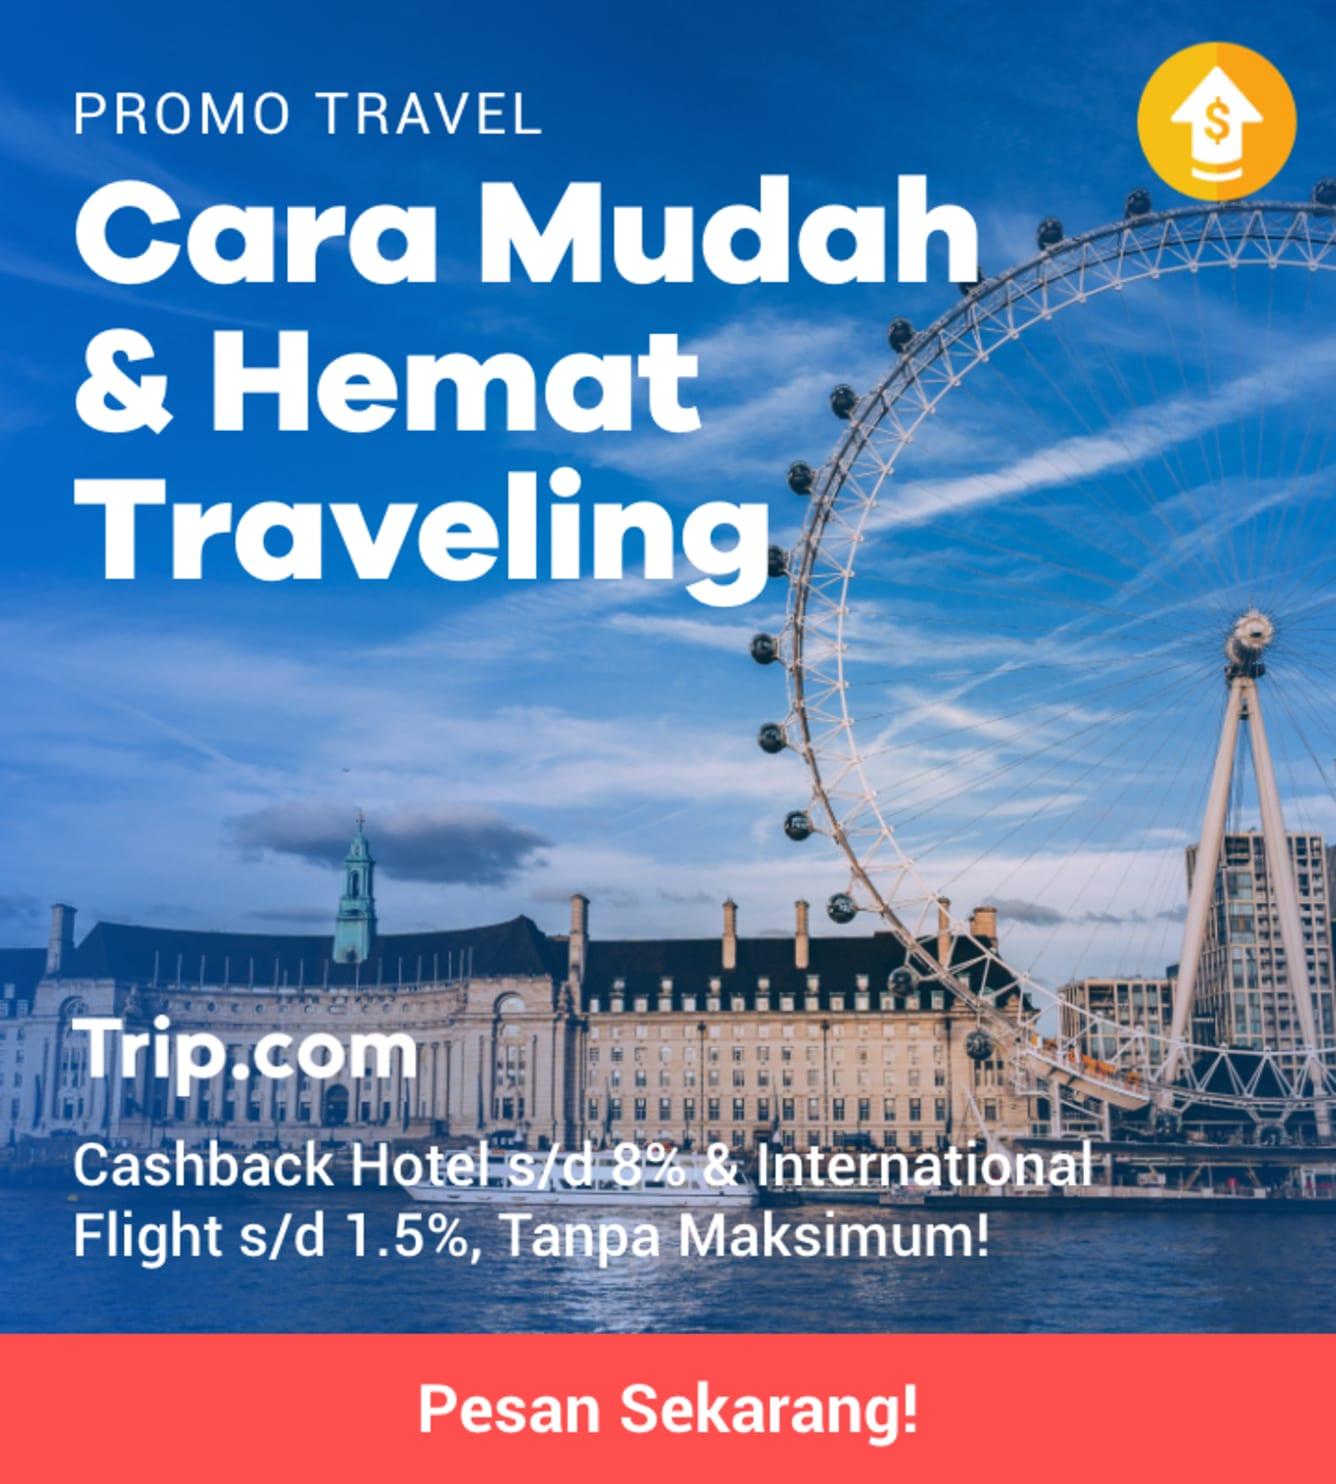 Week 25 - Promo Trip.com